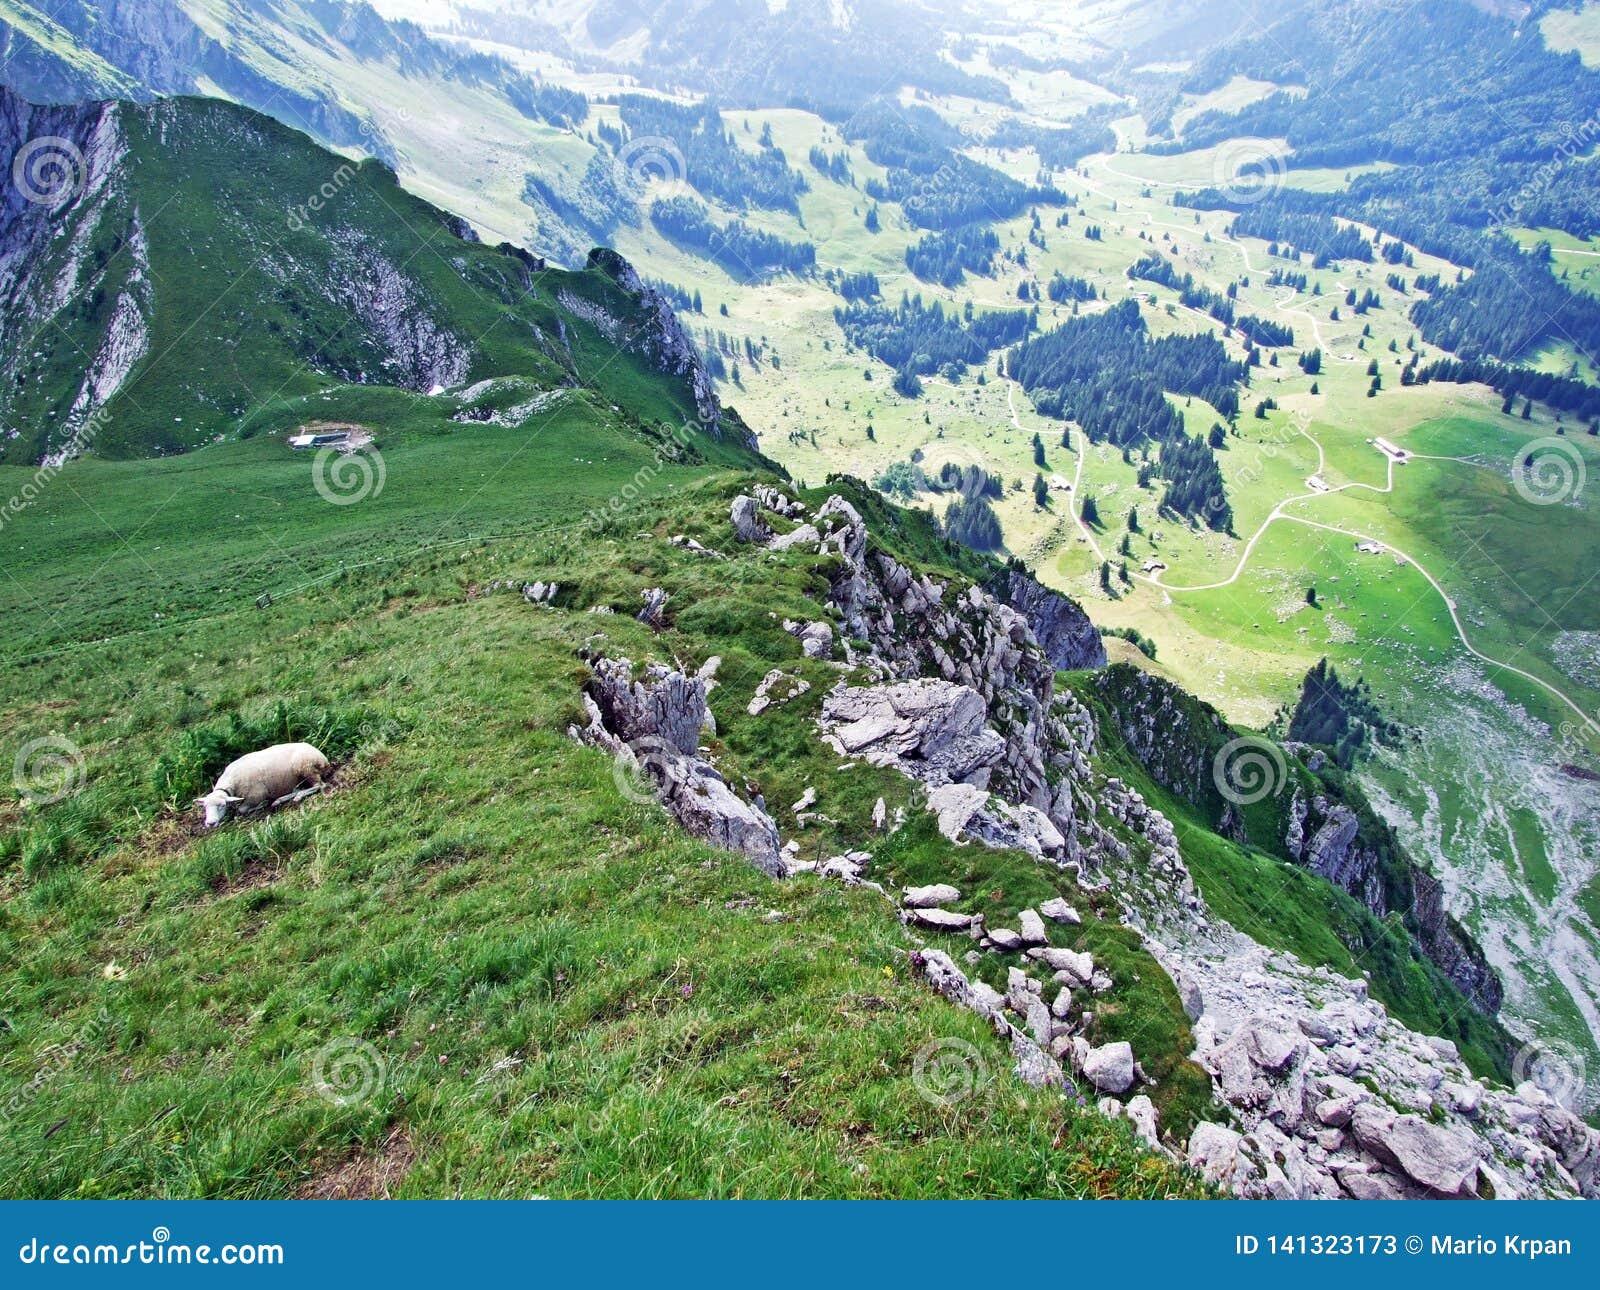 Sheeps on Alpine pastures of Alpstein mountain range seek refreshment from the summer sun